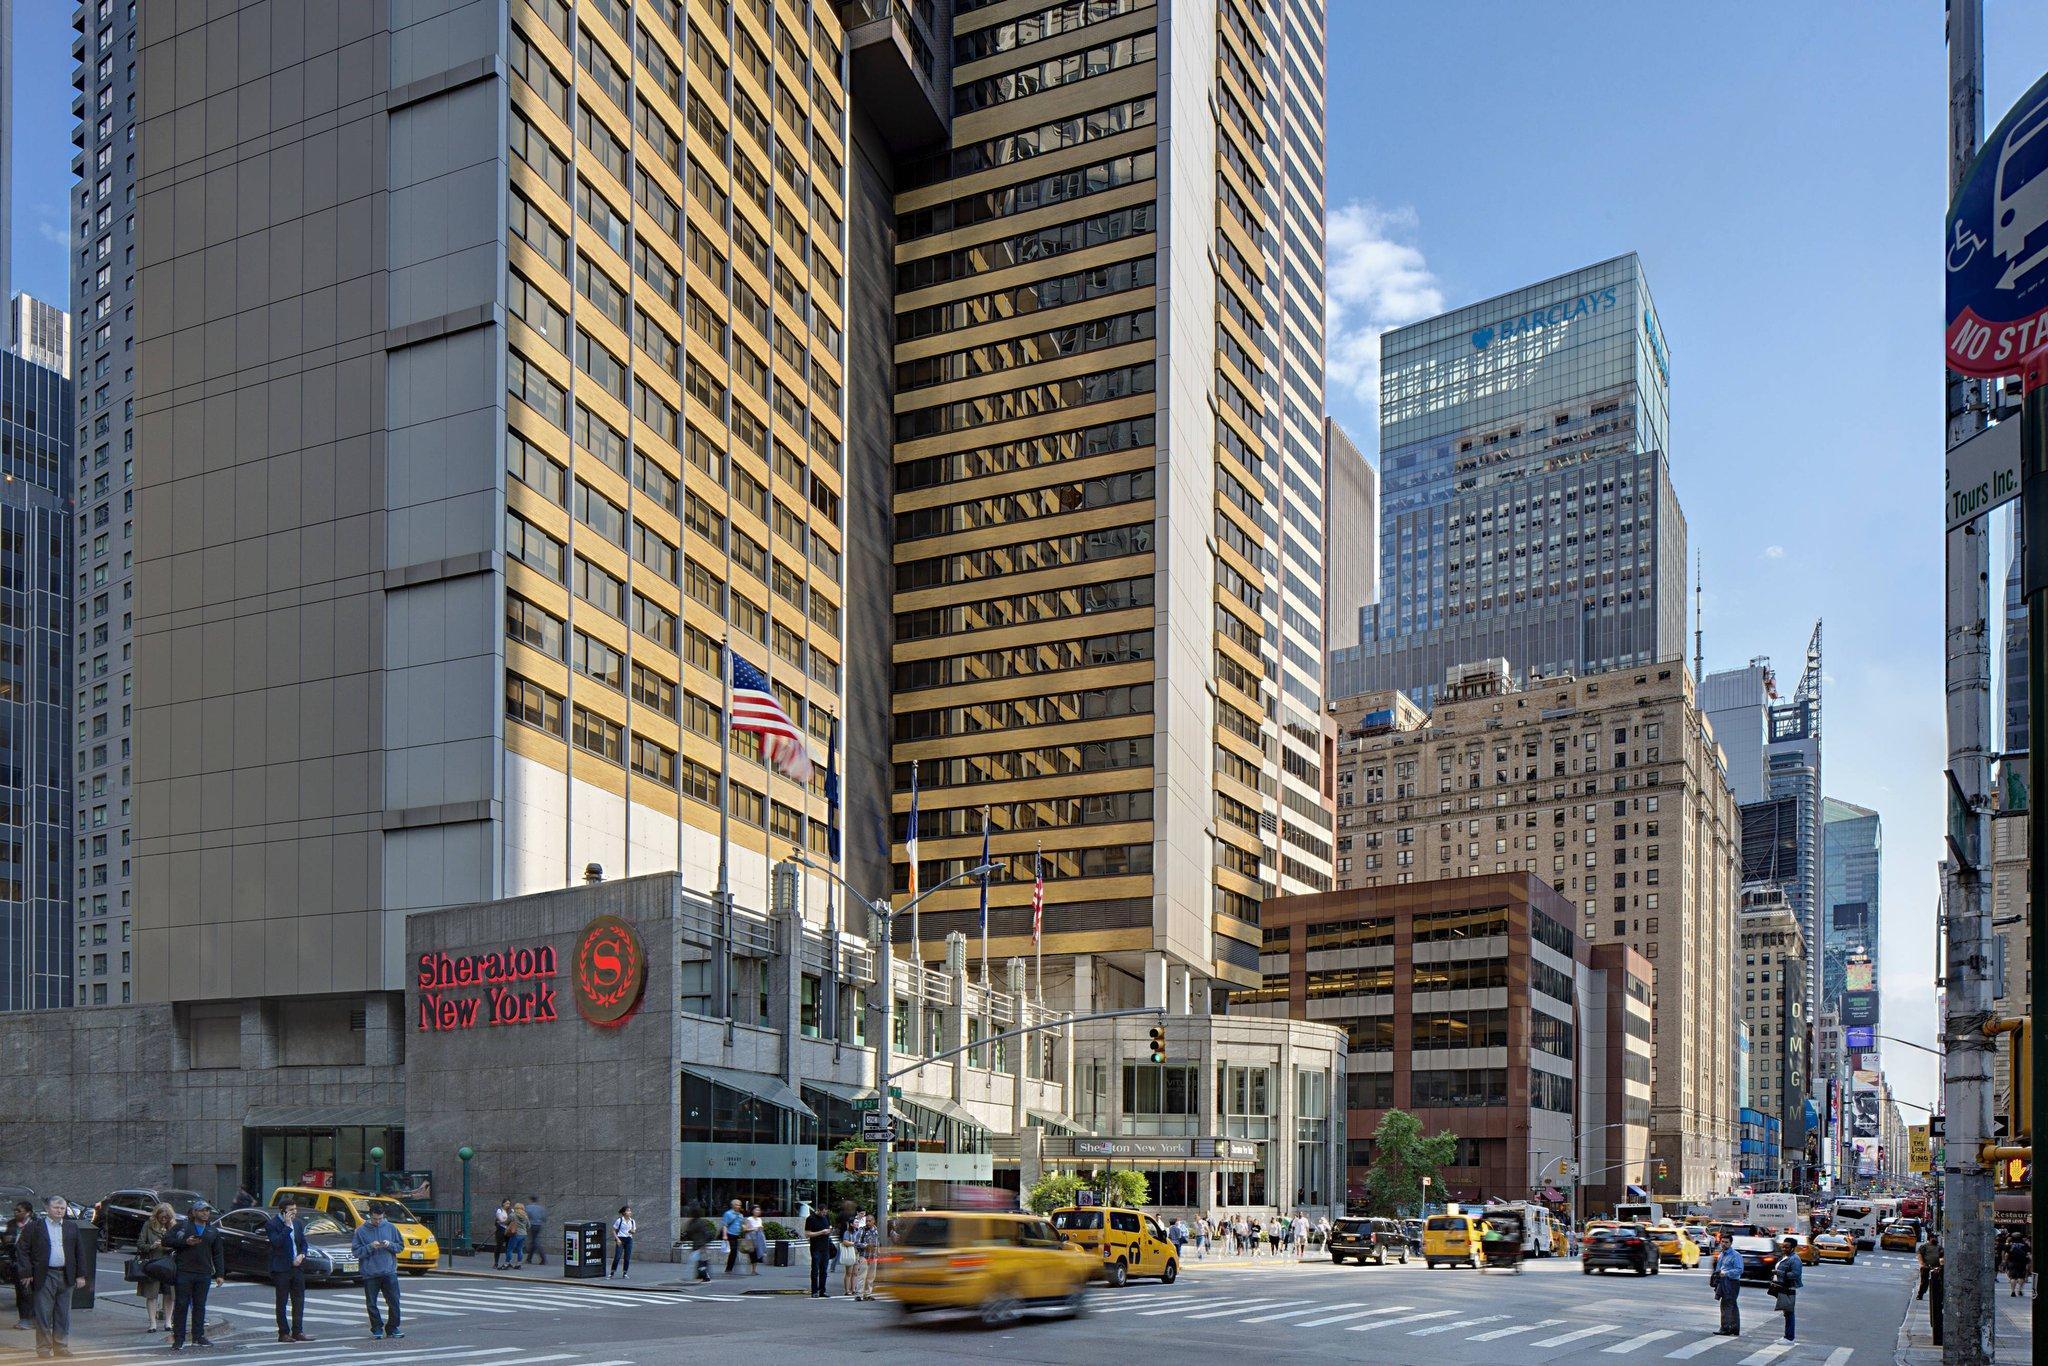 Sheraton New York Times Square Hotel image